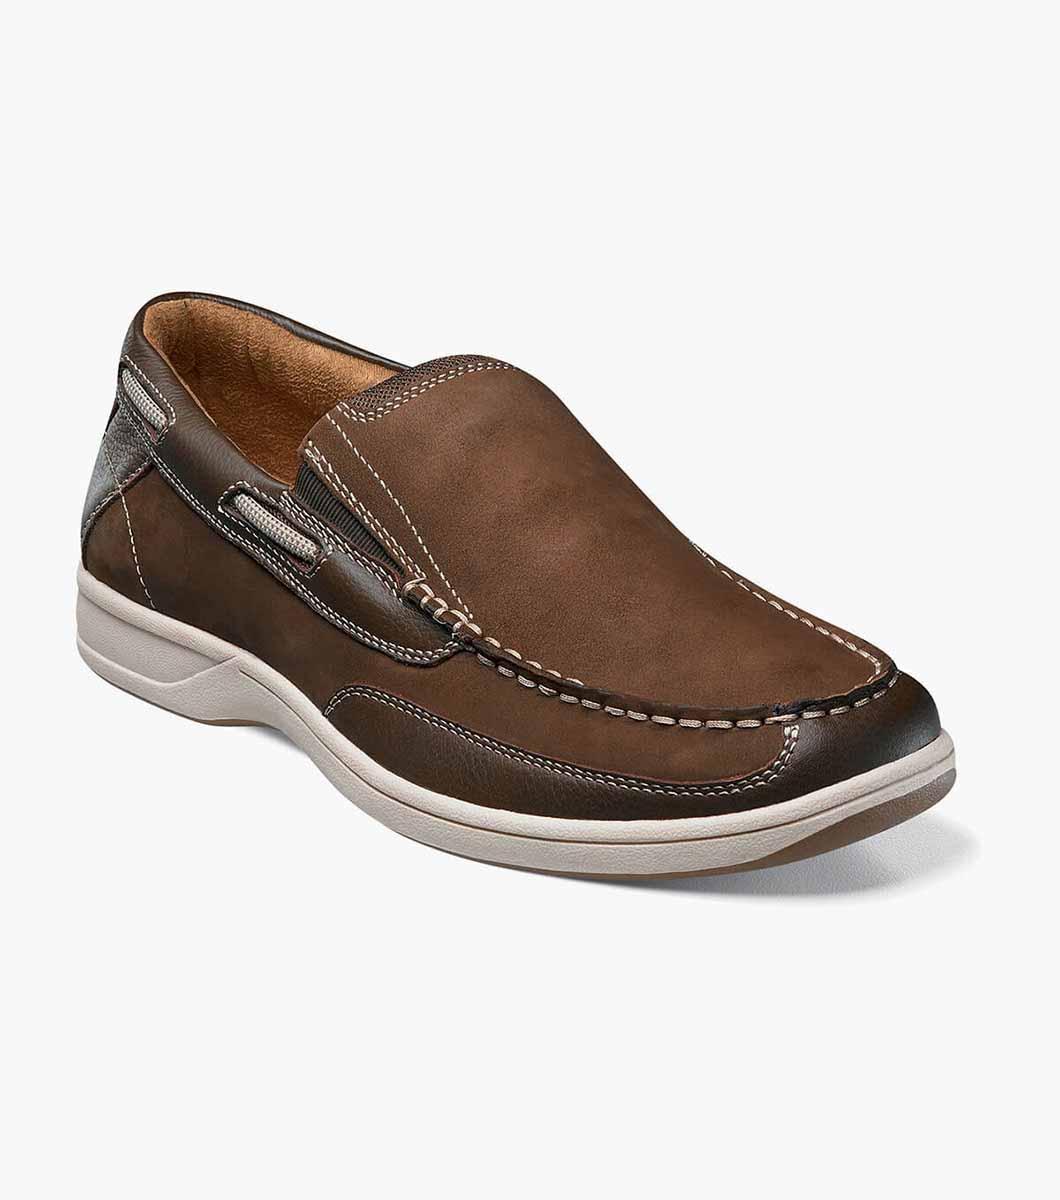 Lakeside Moc Toe Leather Casual Slip On